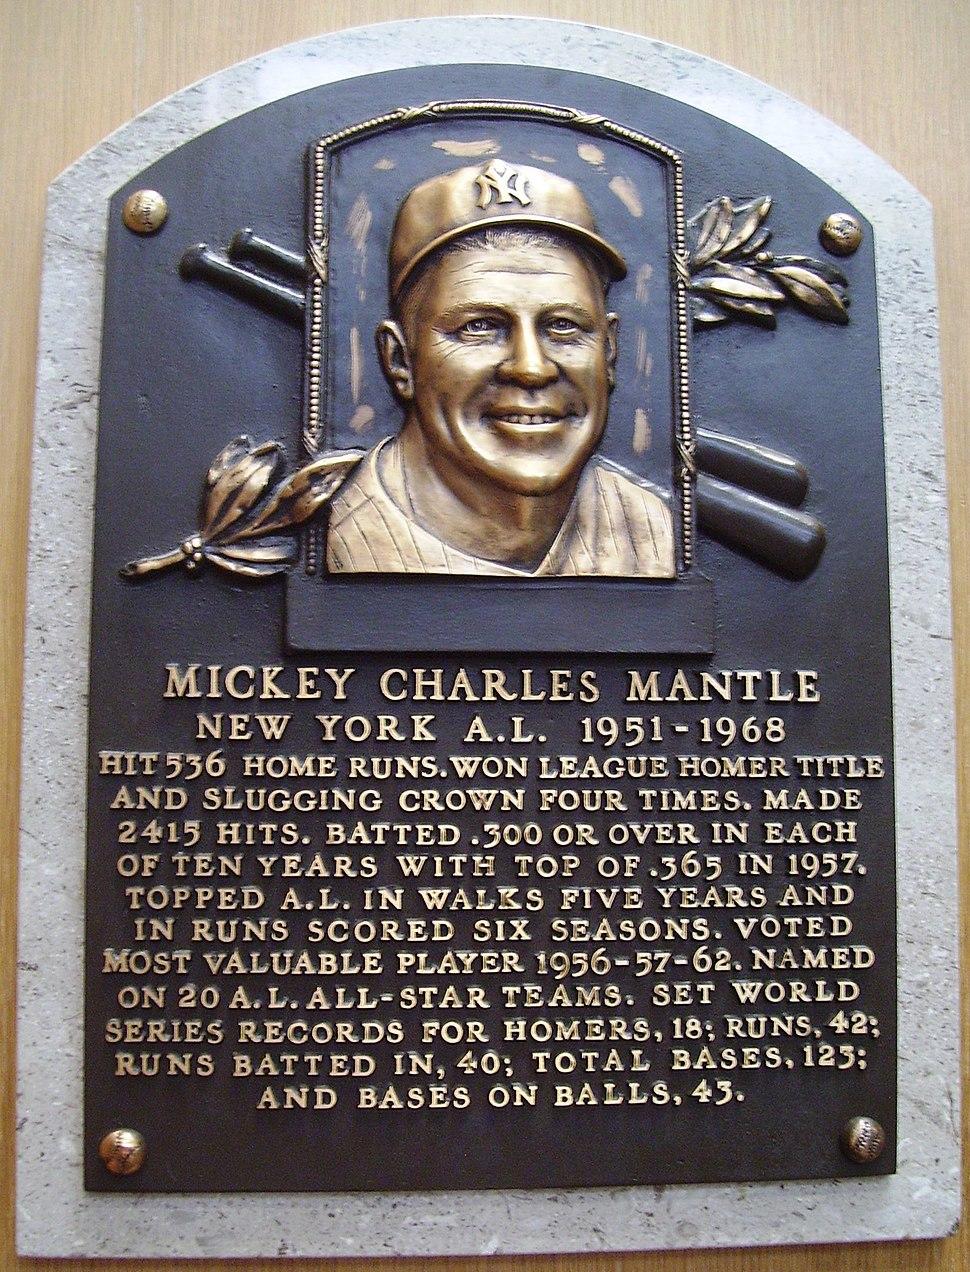 HOF Mantle Mickey plaque